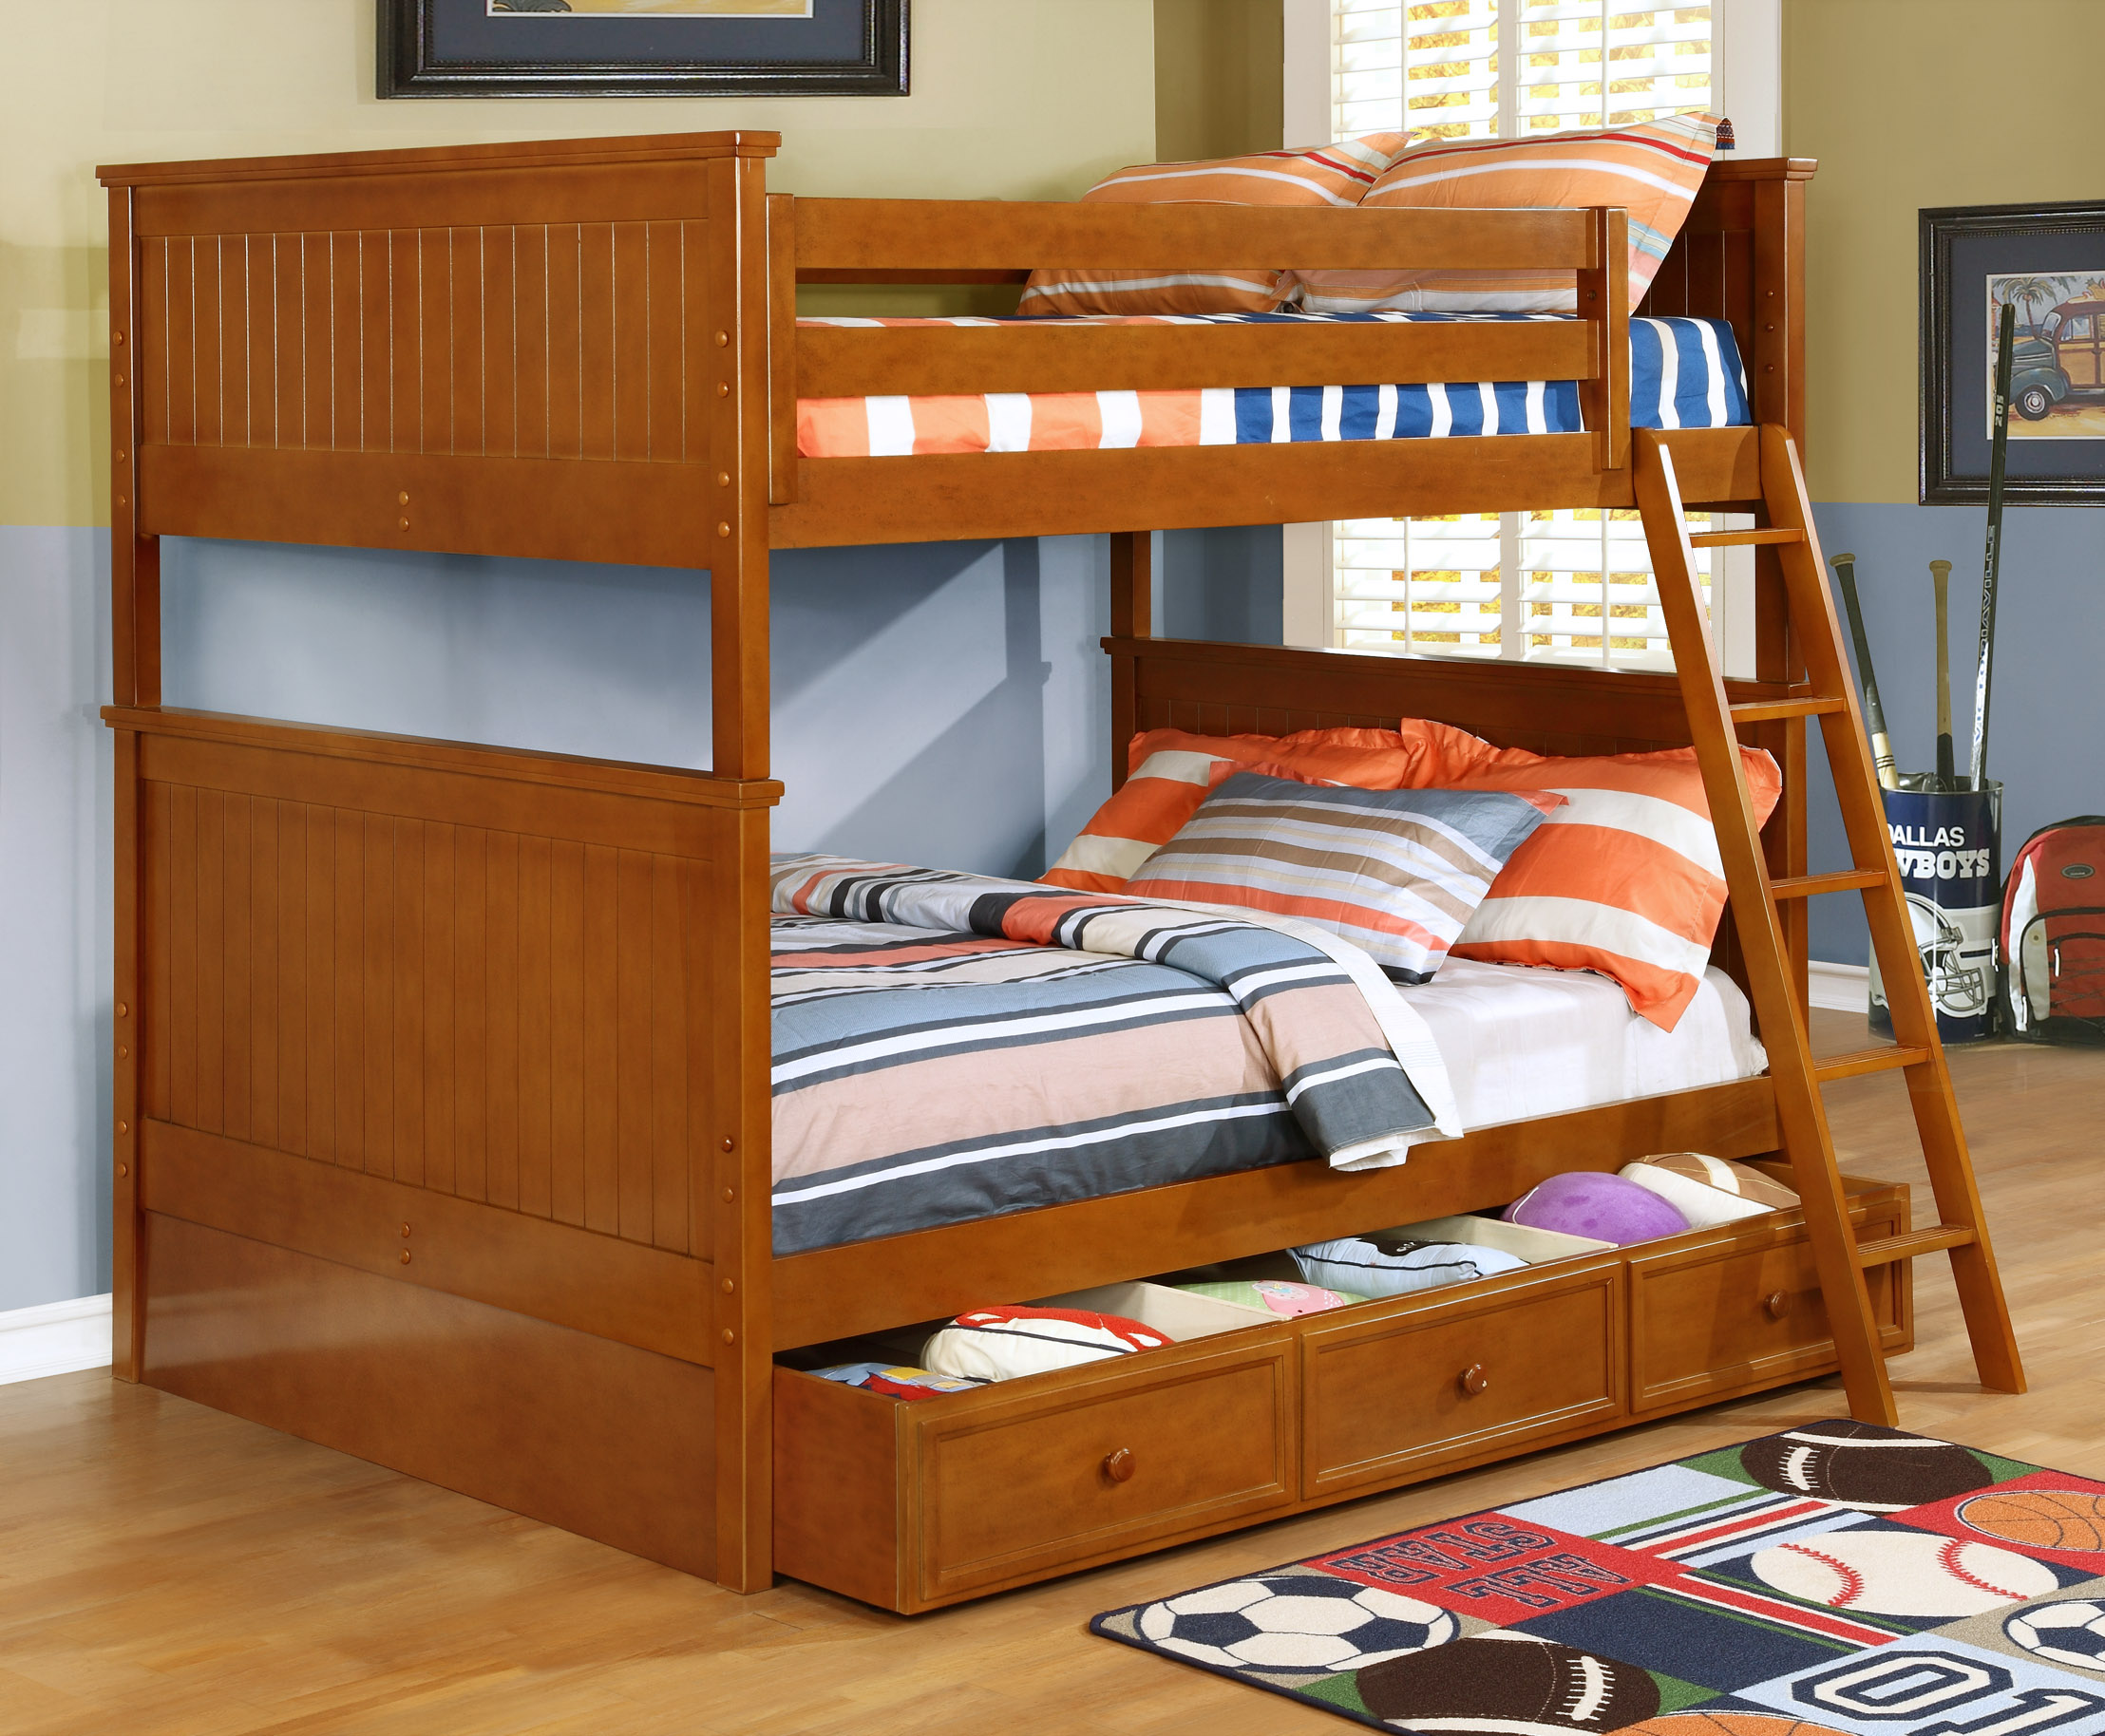 Beadboard Full Over Full Bunk Bed White Rustic Pecan